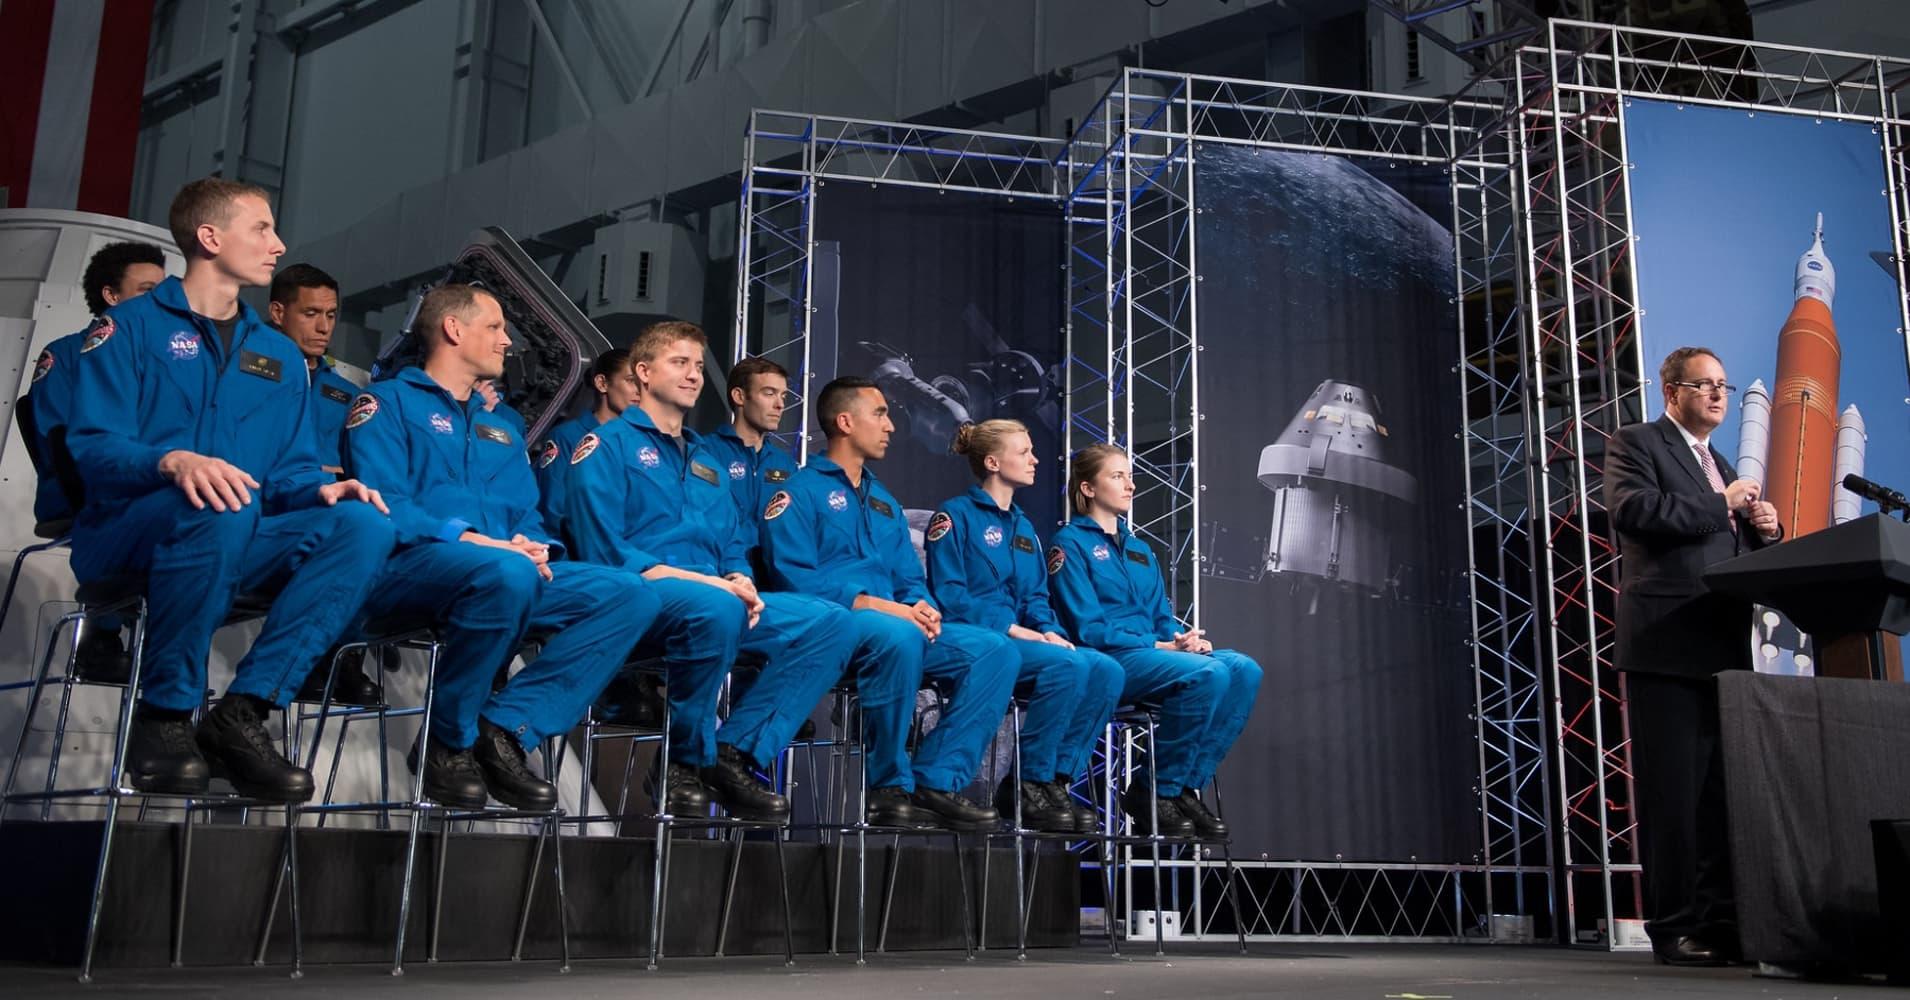 nasa astronauts 2017 - photo #6